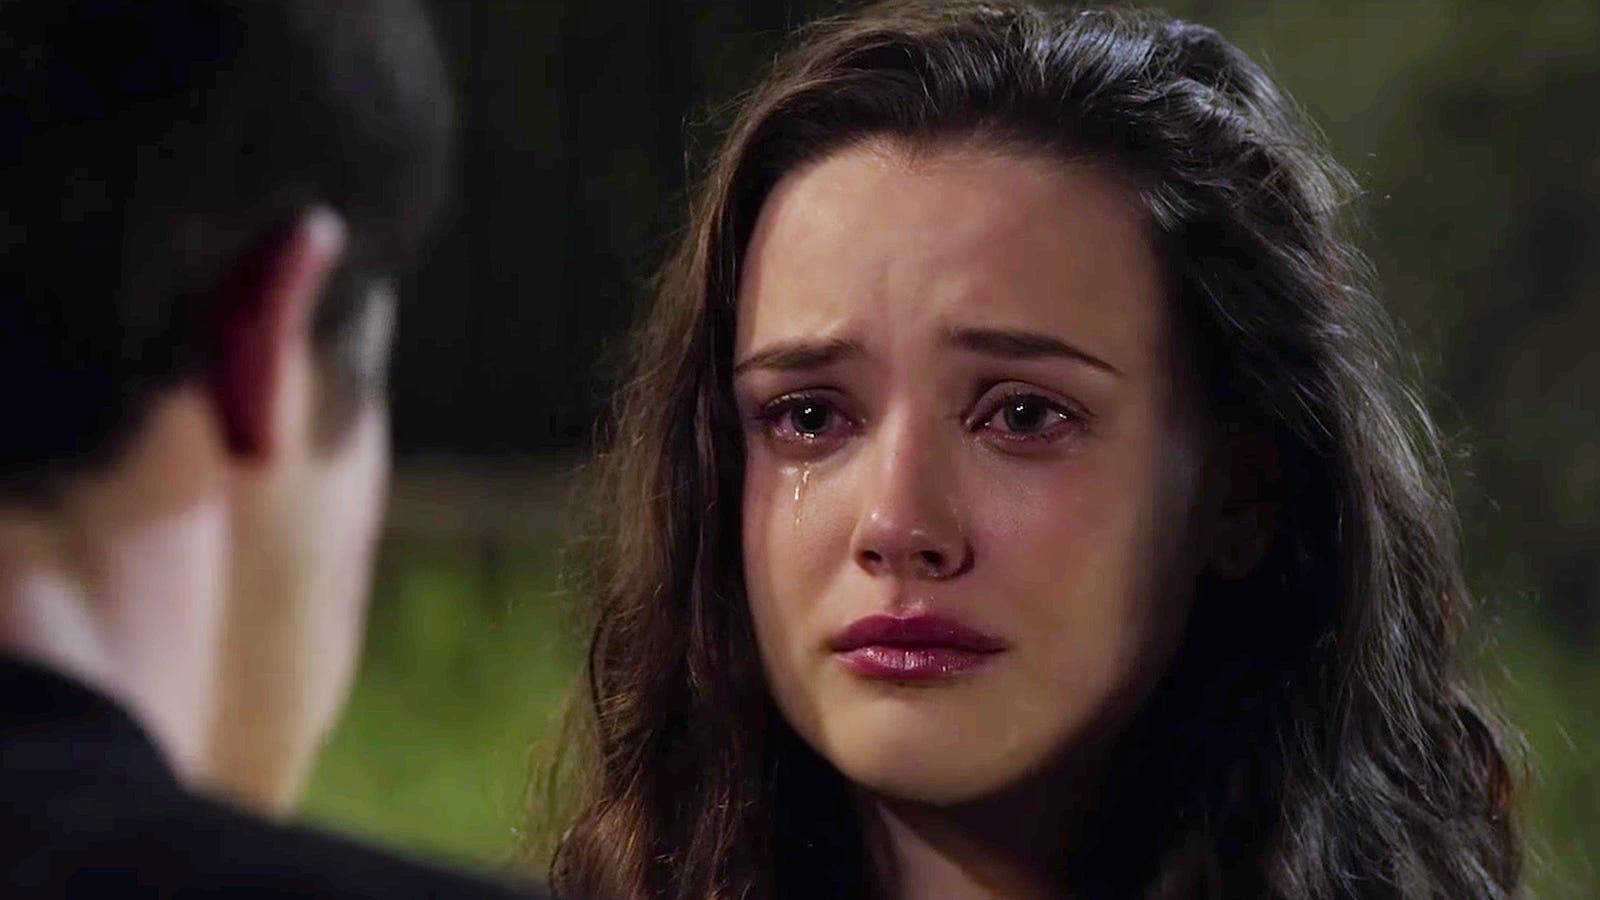 Netflix Renews 13 Reasons Why for a Season 3